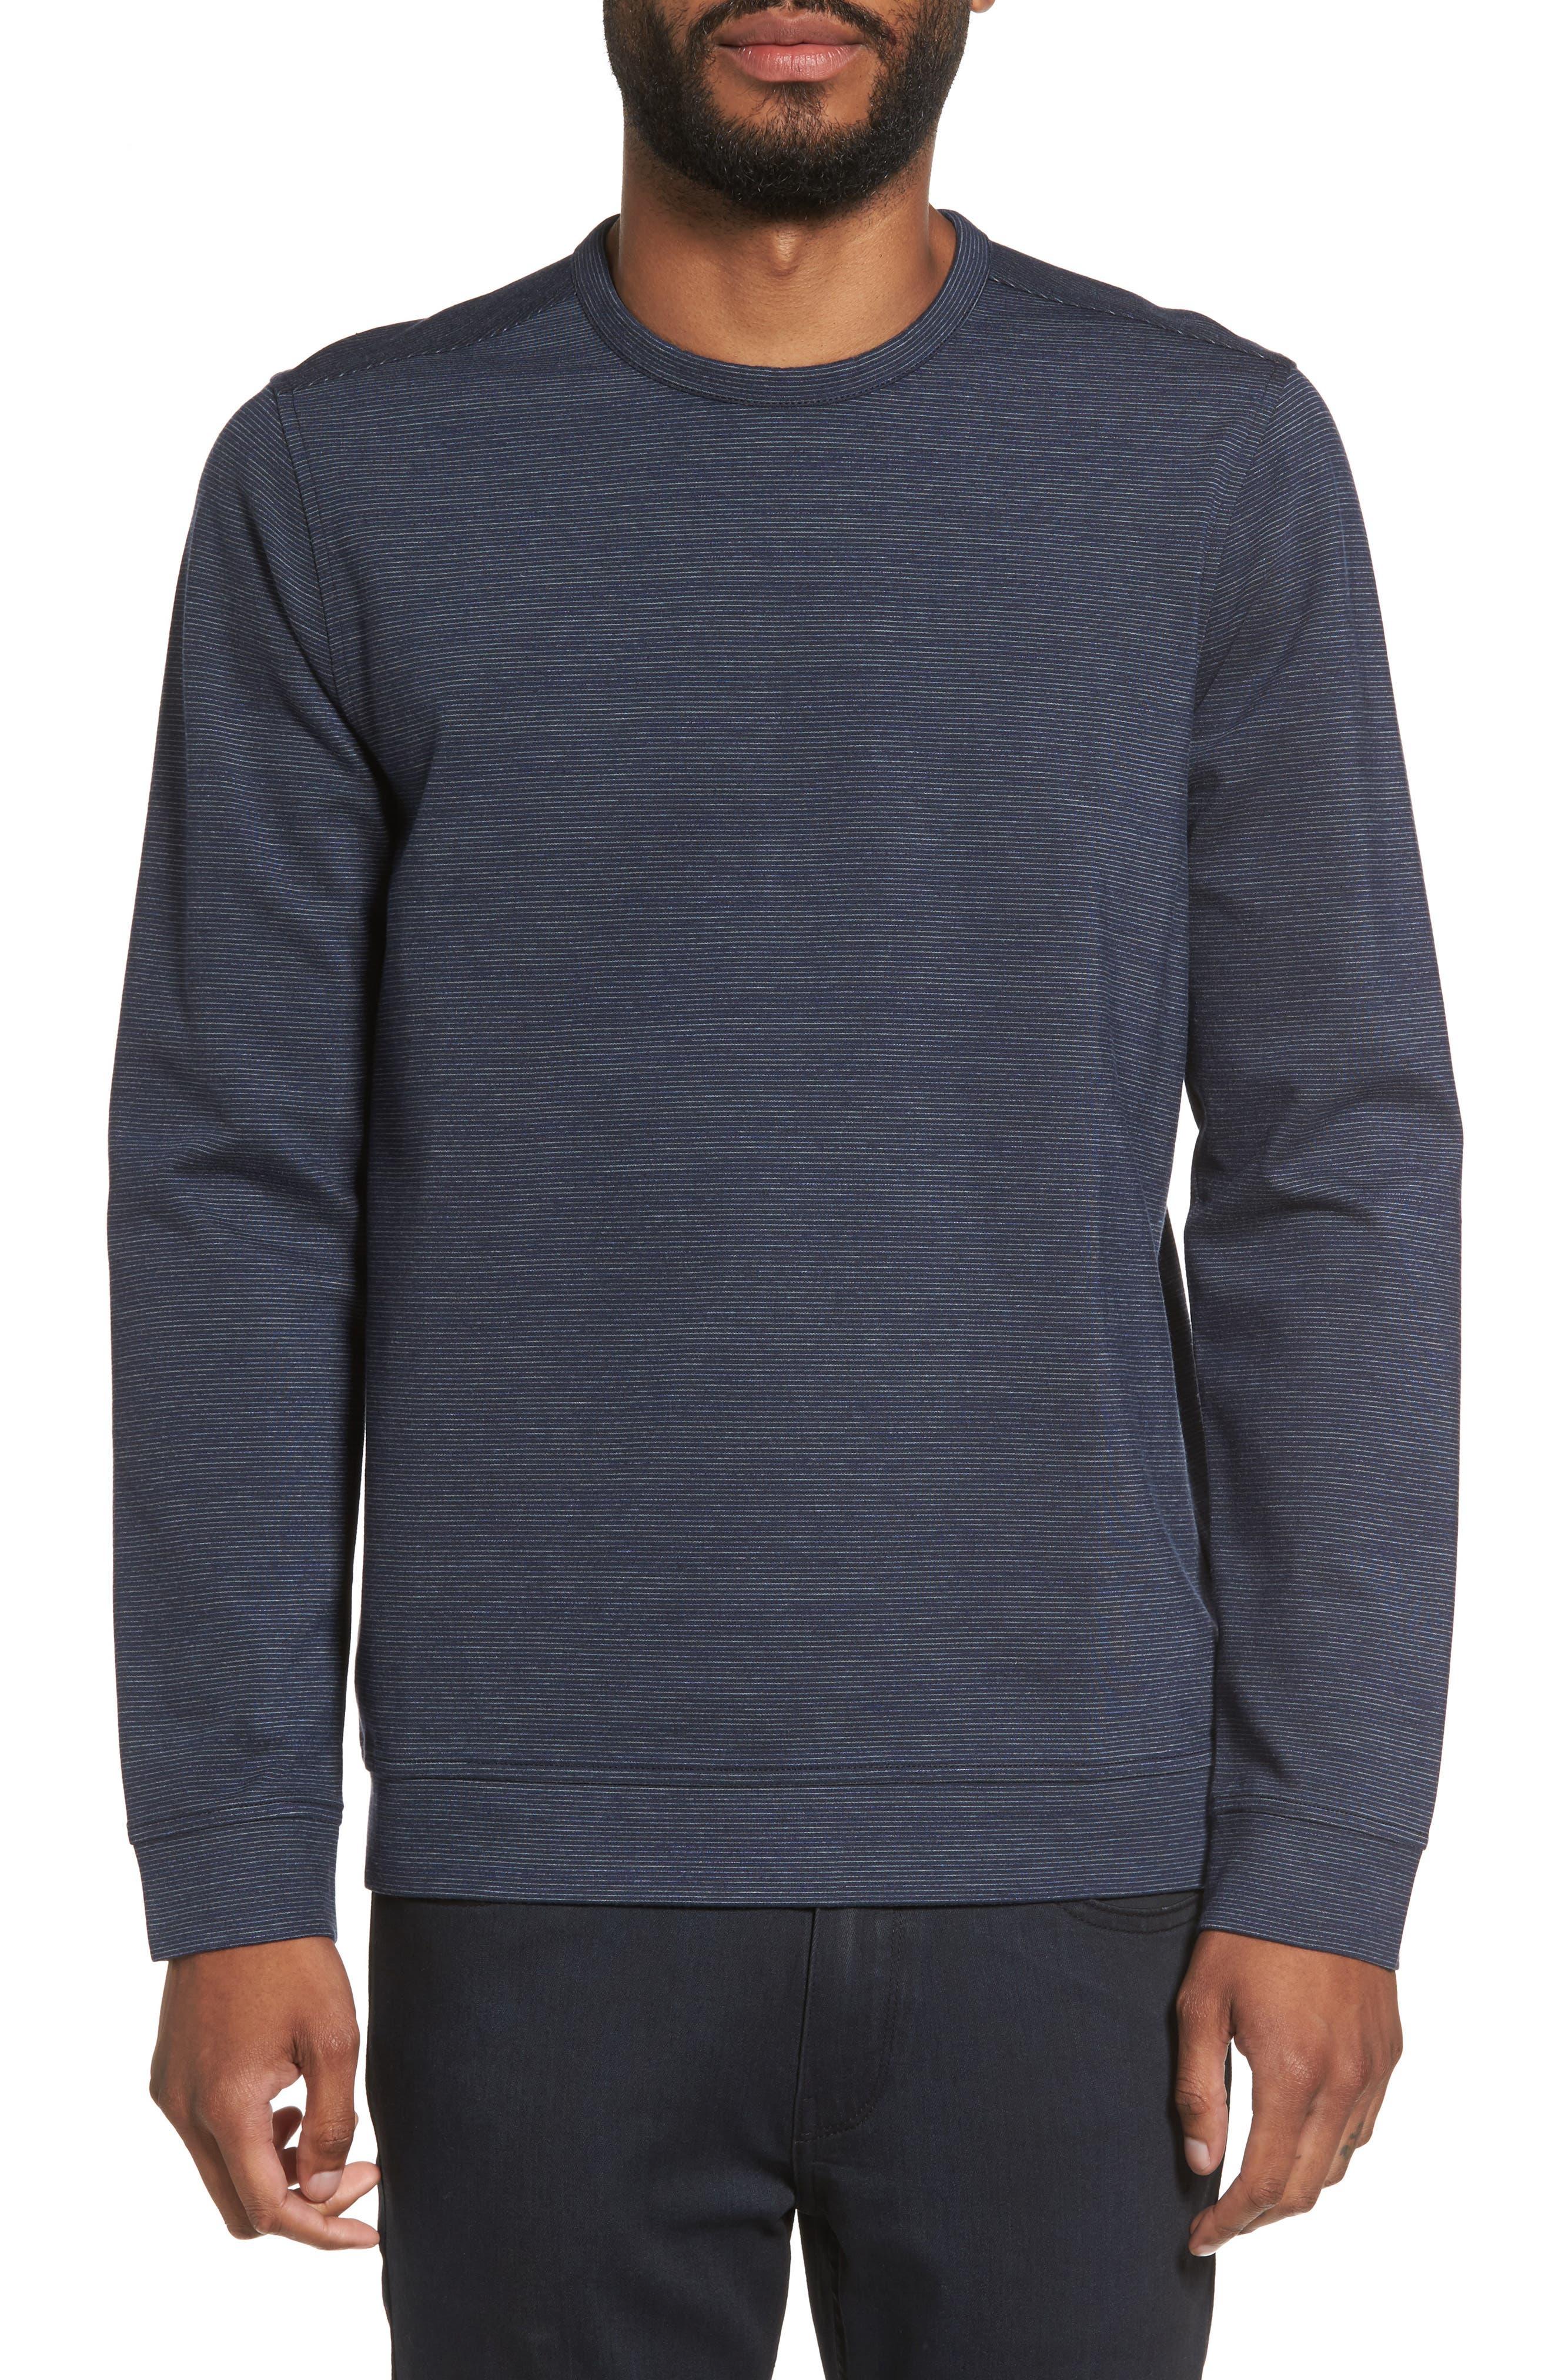 Alternate Image 1 Selected - Calibrate Space Dye Stripe Sweatshirt